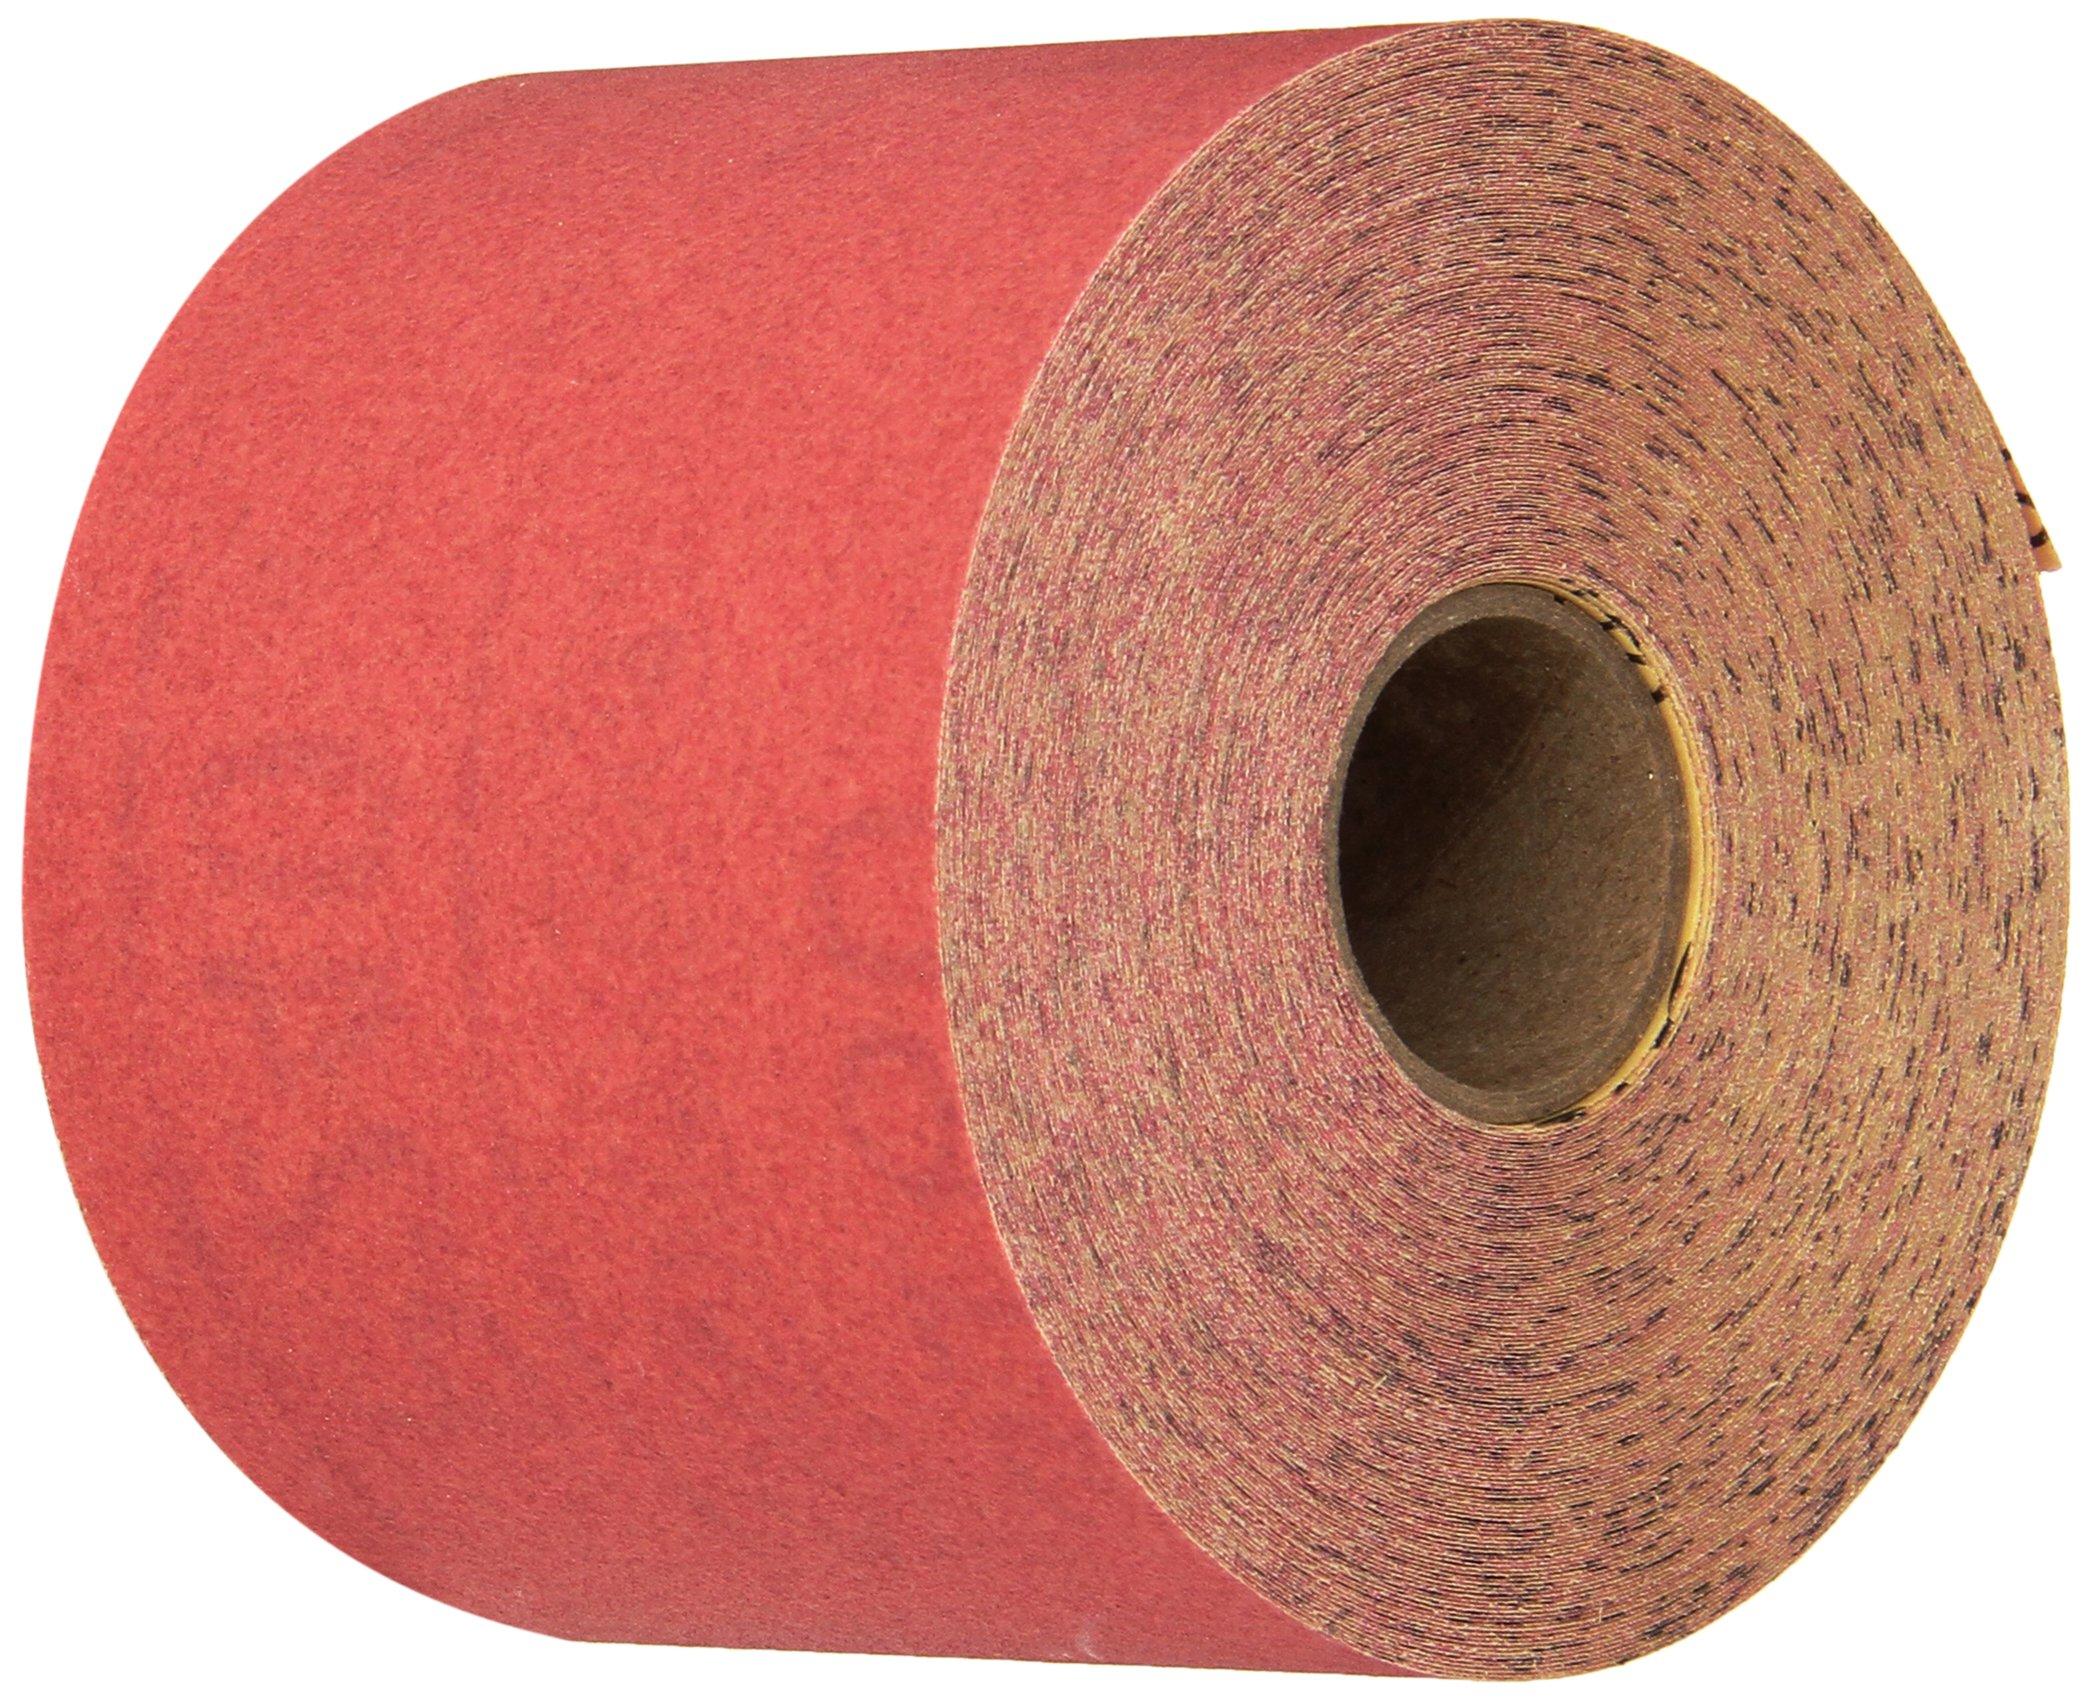 3M 01683 Stikit Red 2-3/4'' x 25 Yard P240 Grit Abrasive Sheet Roll by 3M